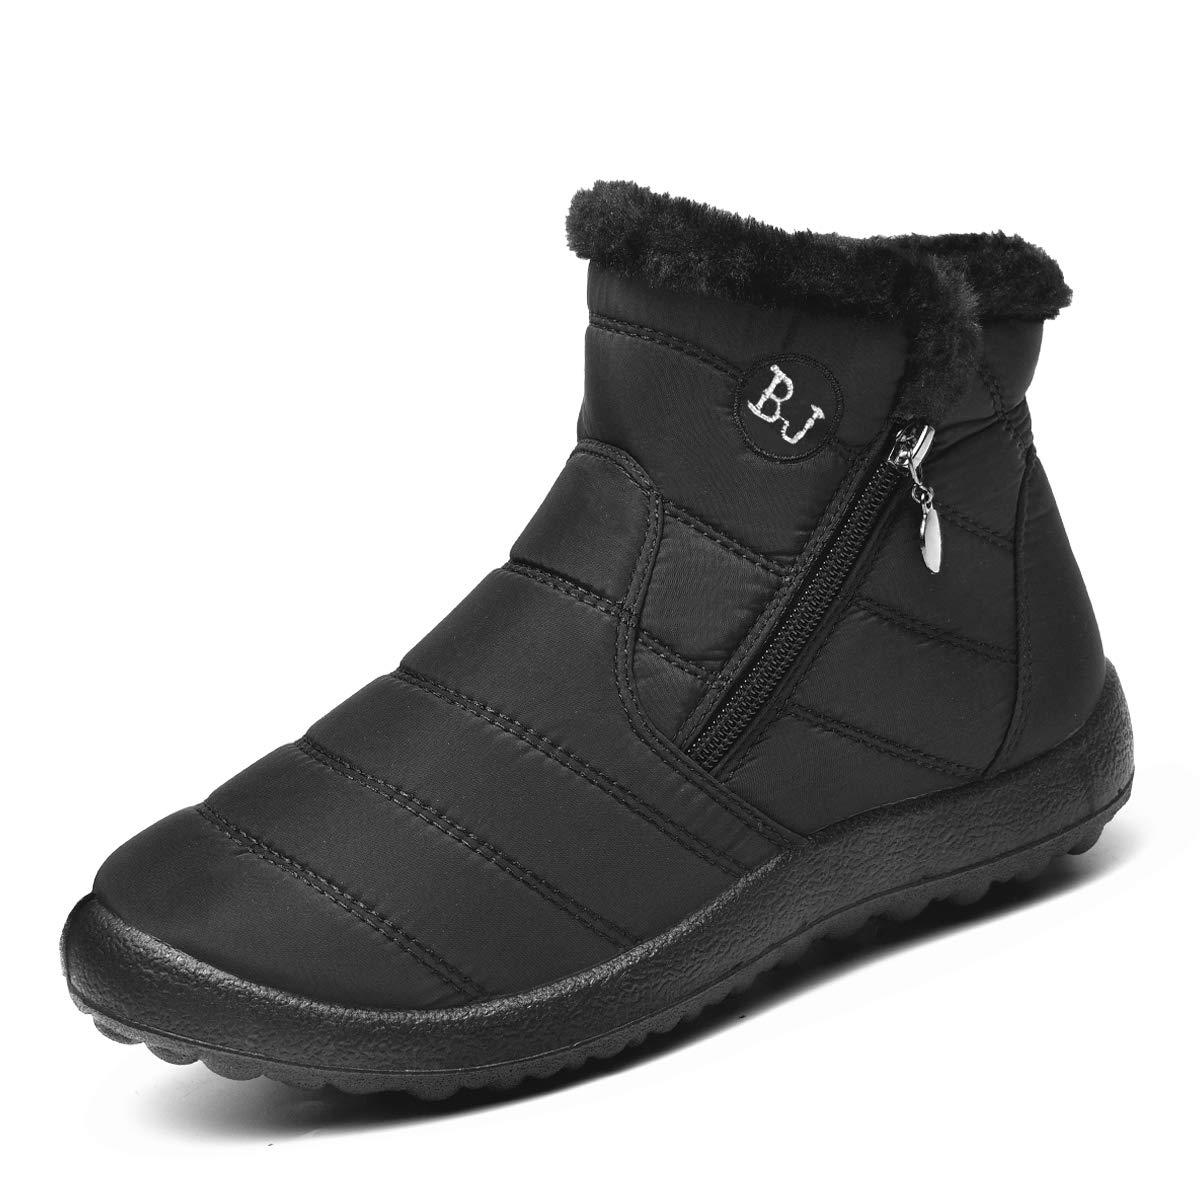 Ginjang Women Winter Snow Boots Warm Ankle Boots Anti-Slip Waterproof Winter Shoes Slip On Booties Sneakers